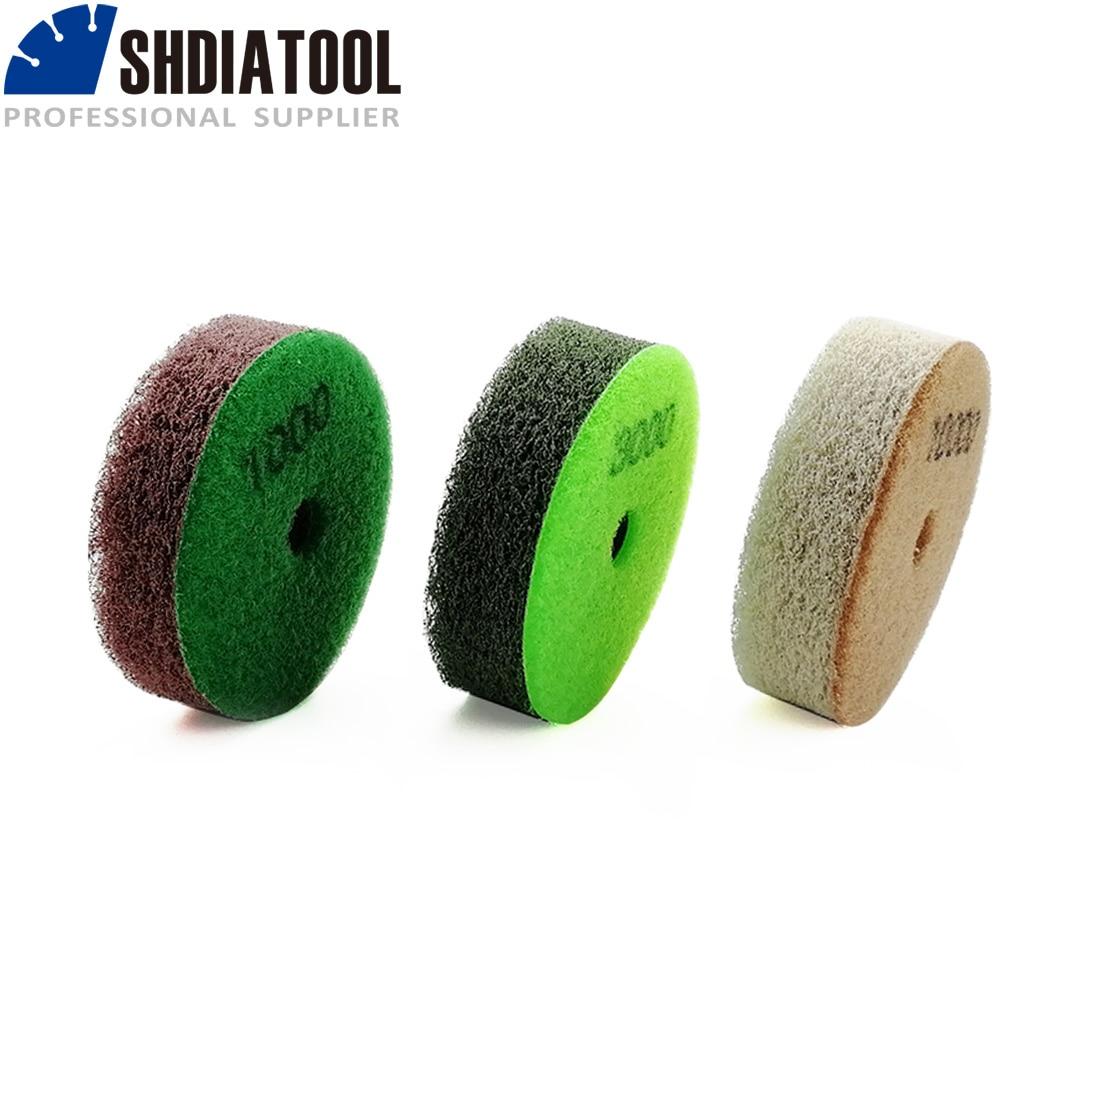 SHDIATOOL 3pcs/Set 80mm Sponge Diamond Polishing Pads Dia 3 Inch Sanding Disc For Softer Stones Marble Sandstone Polishing